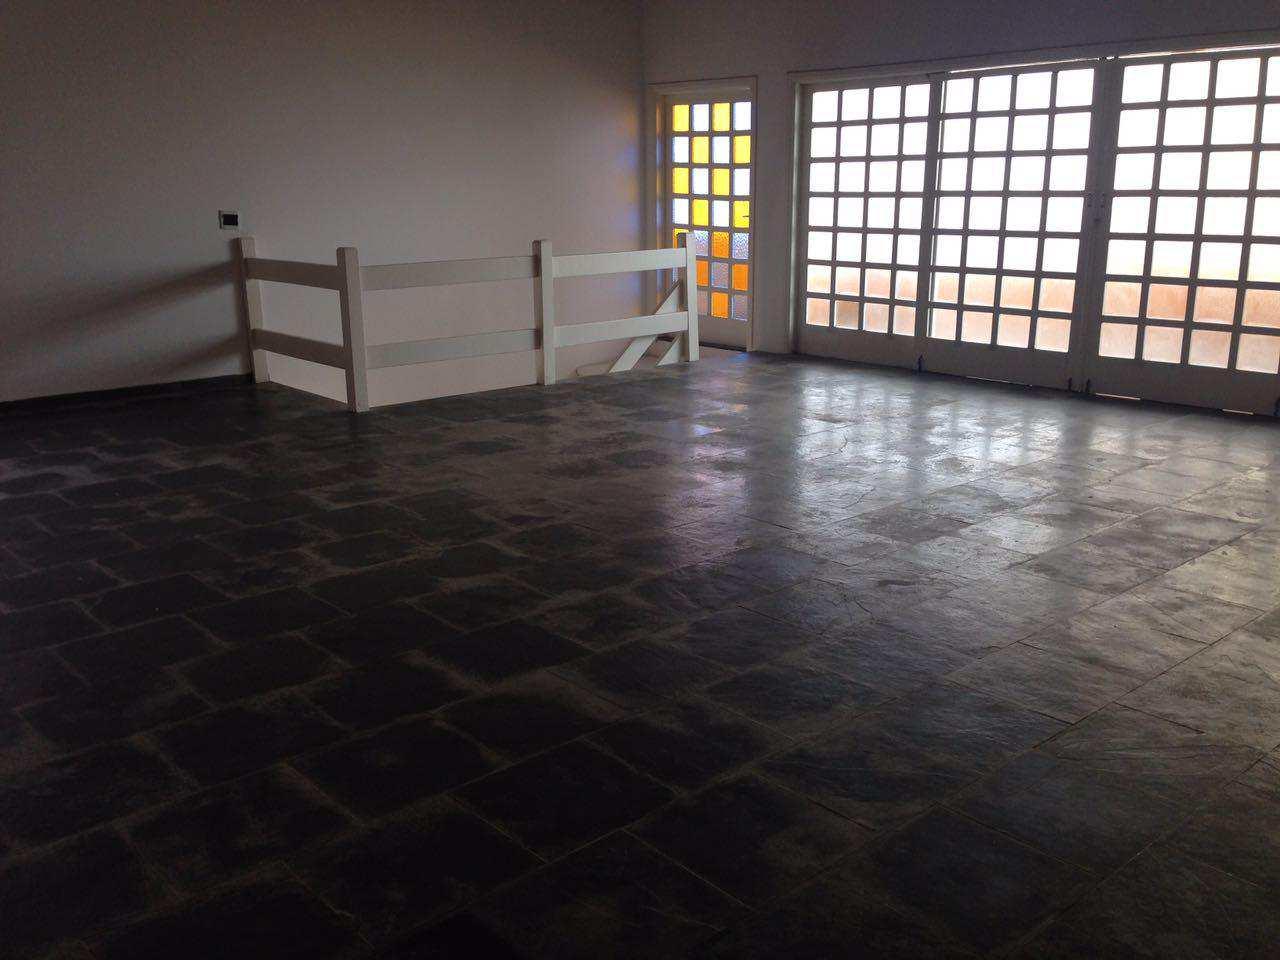 Casa com 4 dorms, Satélite, Itanhaém - R$ 600 mil, Cod: 4897